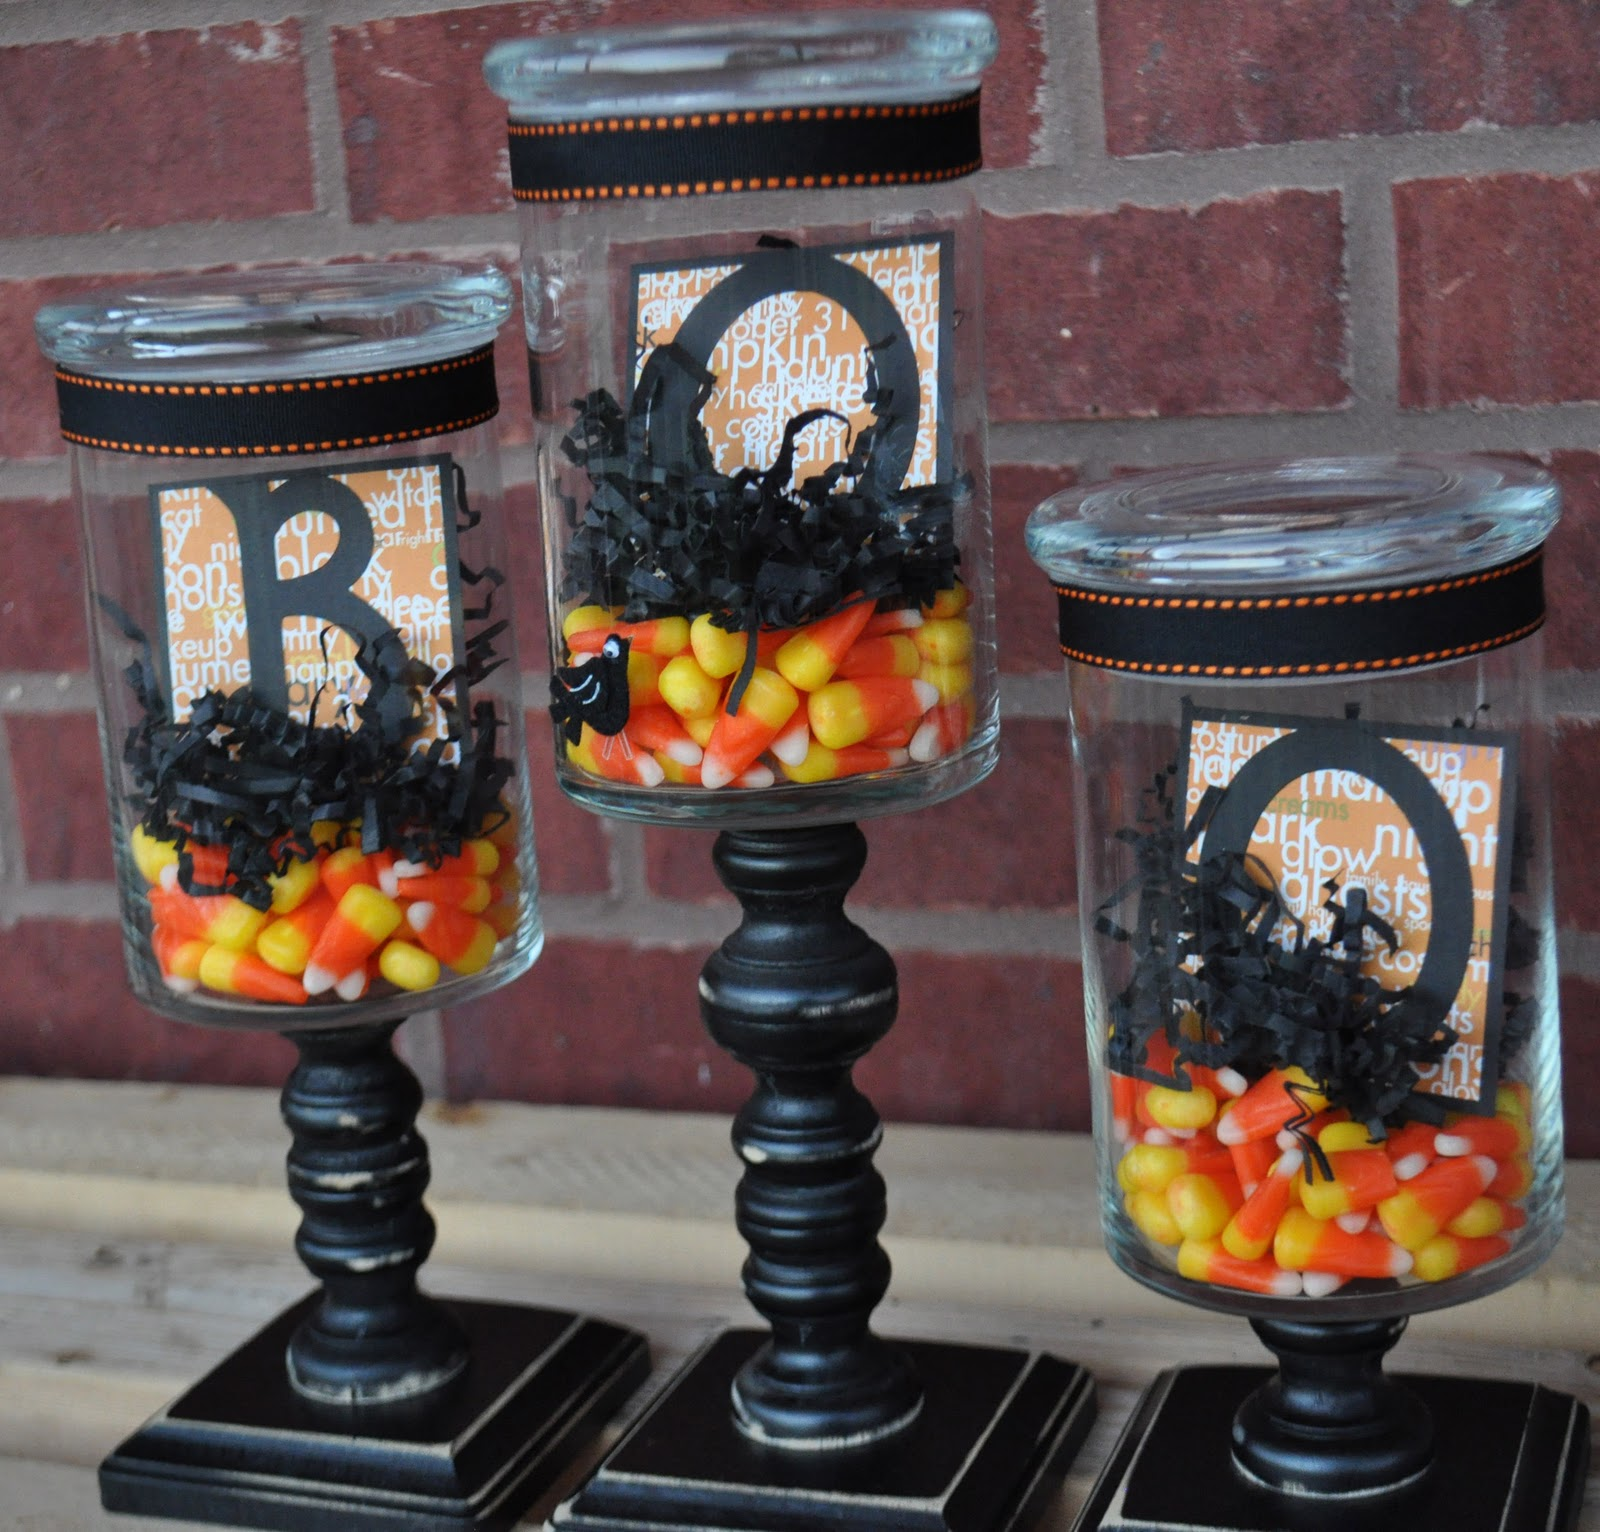 The autocrat halloween apothecary jars